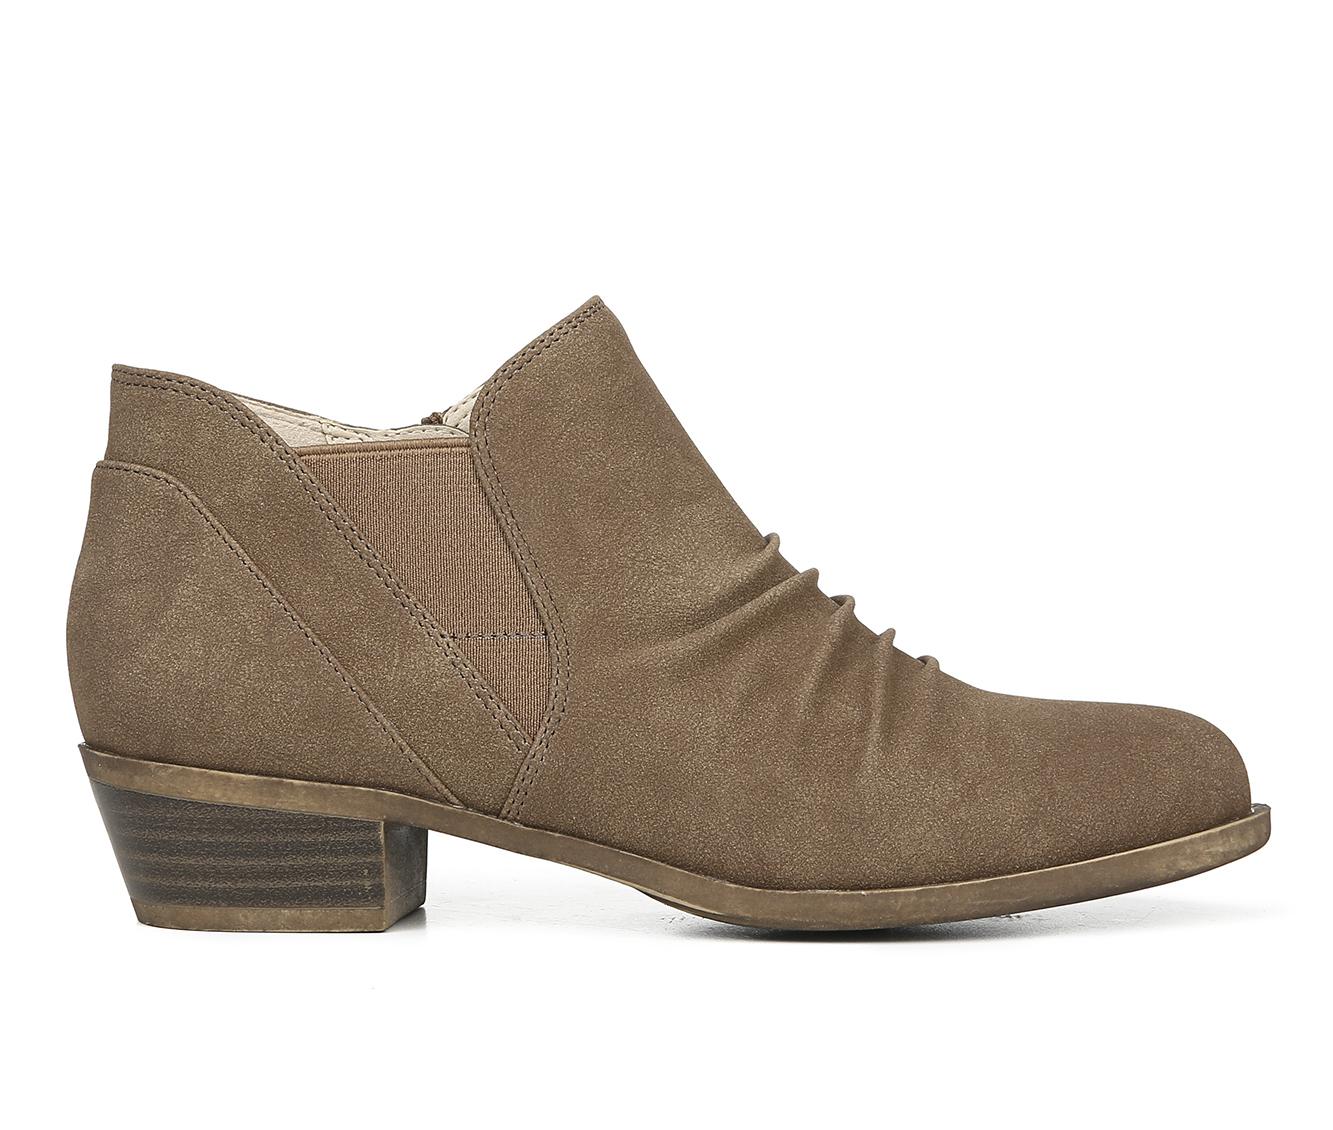 LifeStride Aurora Women's Boots (Brown - Faux Leather)